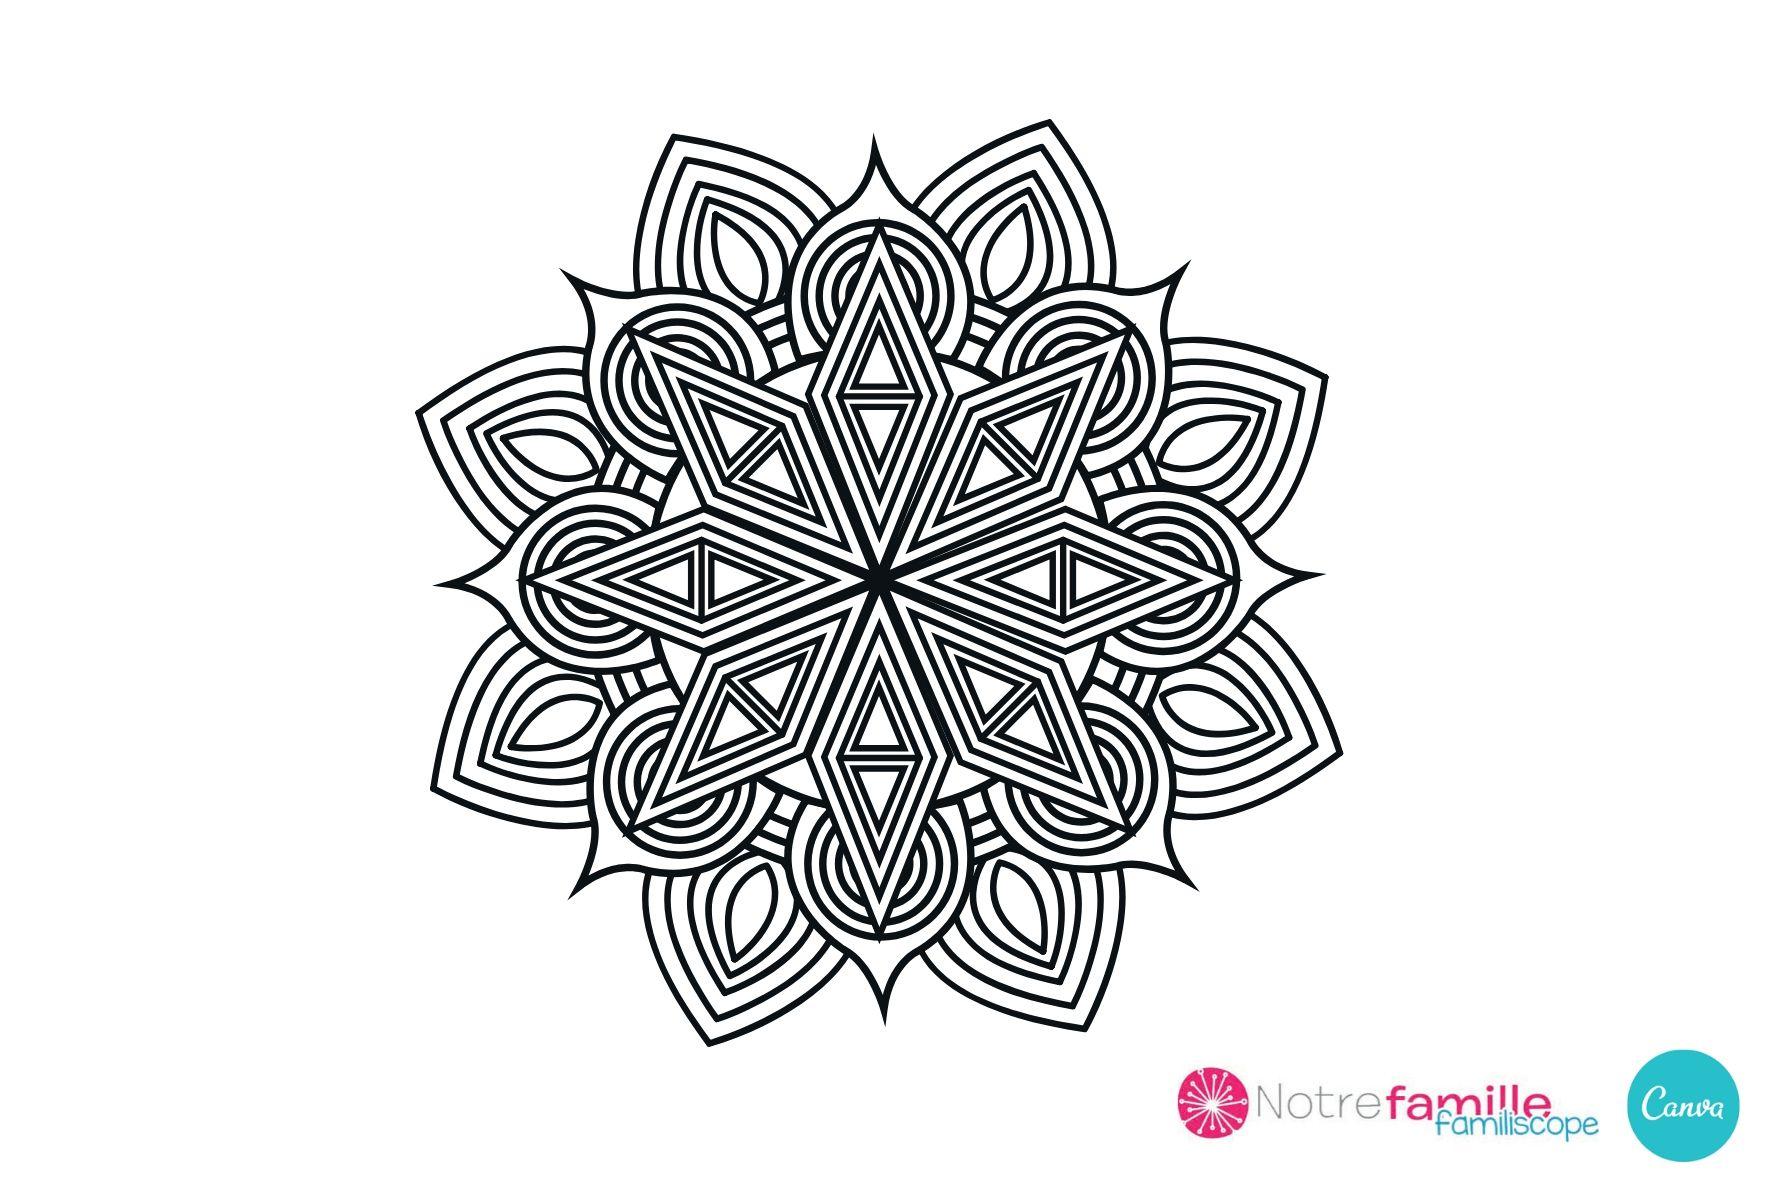 Coloriage De Mandala À Imprimer - Niveau Facile pour Mandala Facile À Imprimer